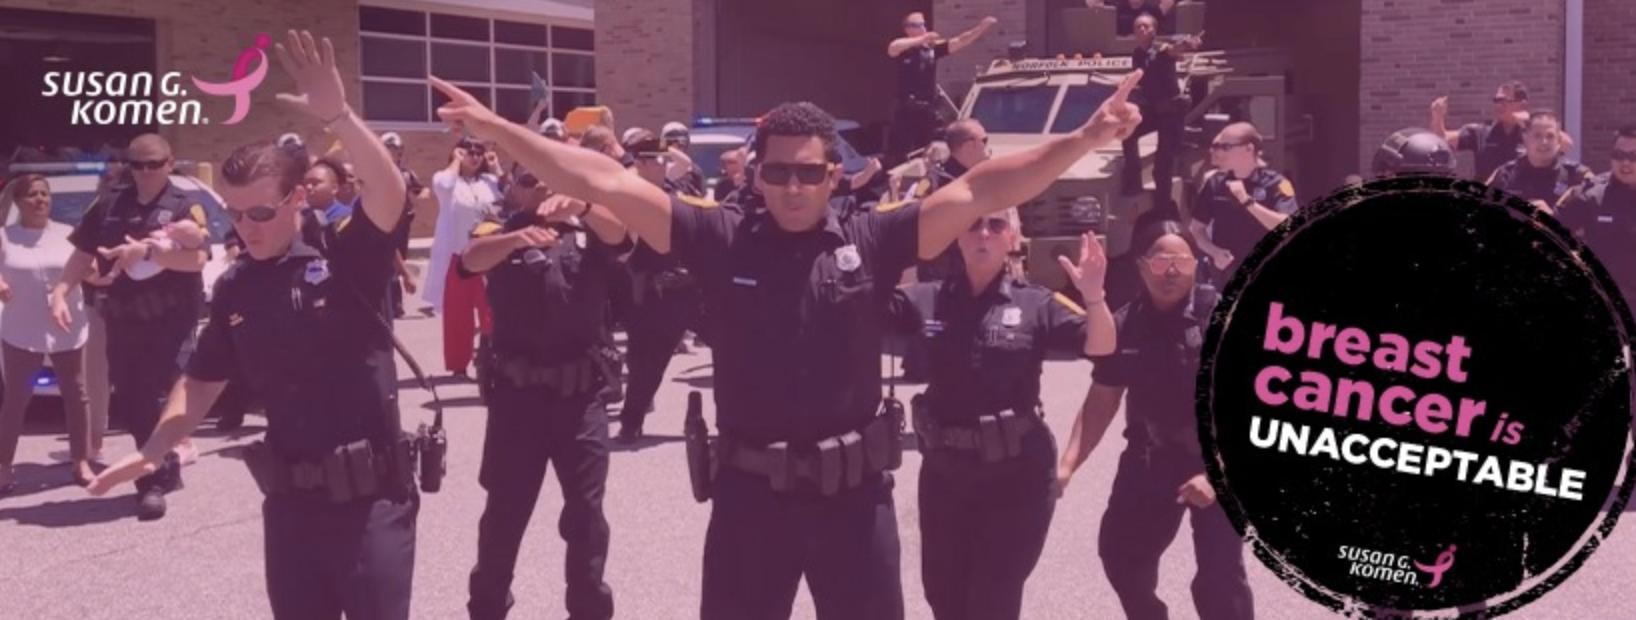 Norfolk Police Department Humanizes Their Brand